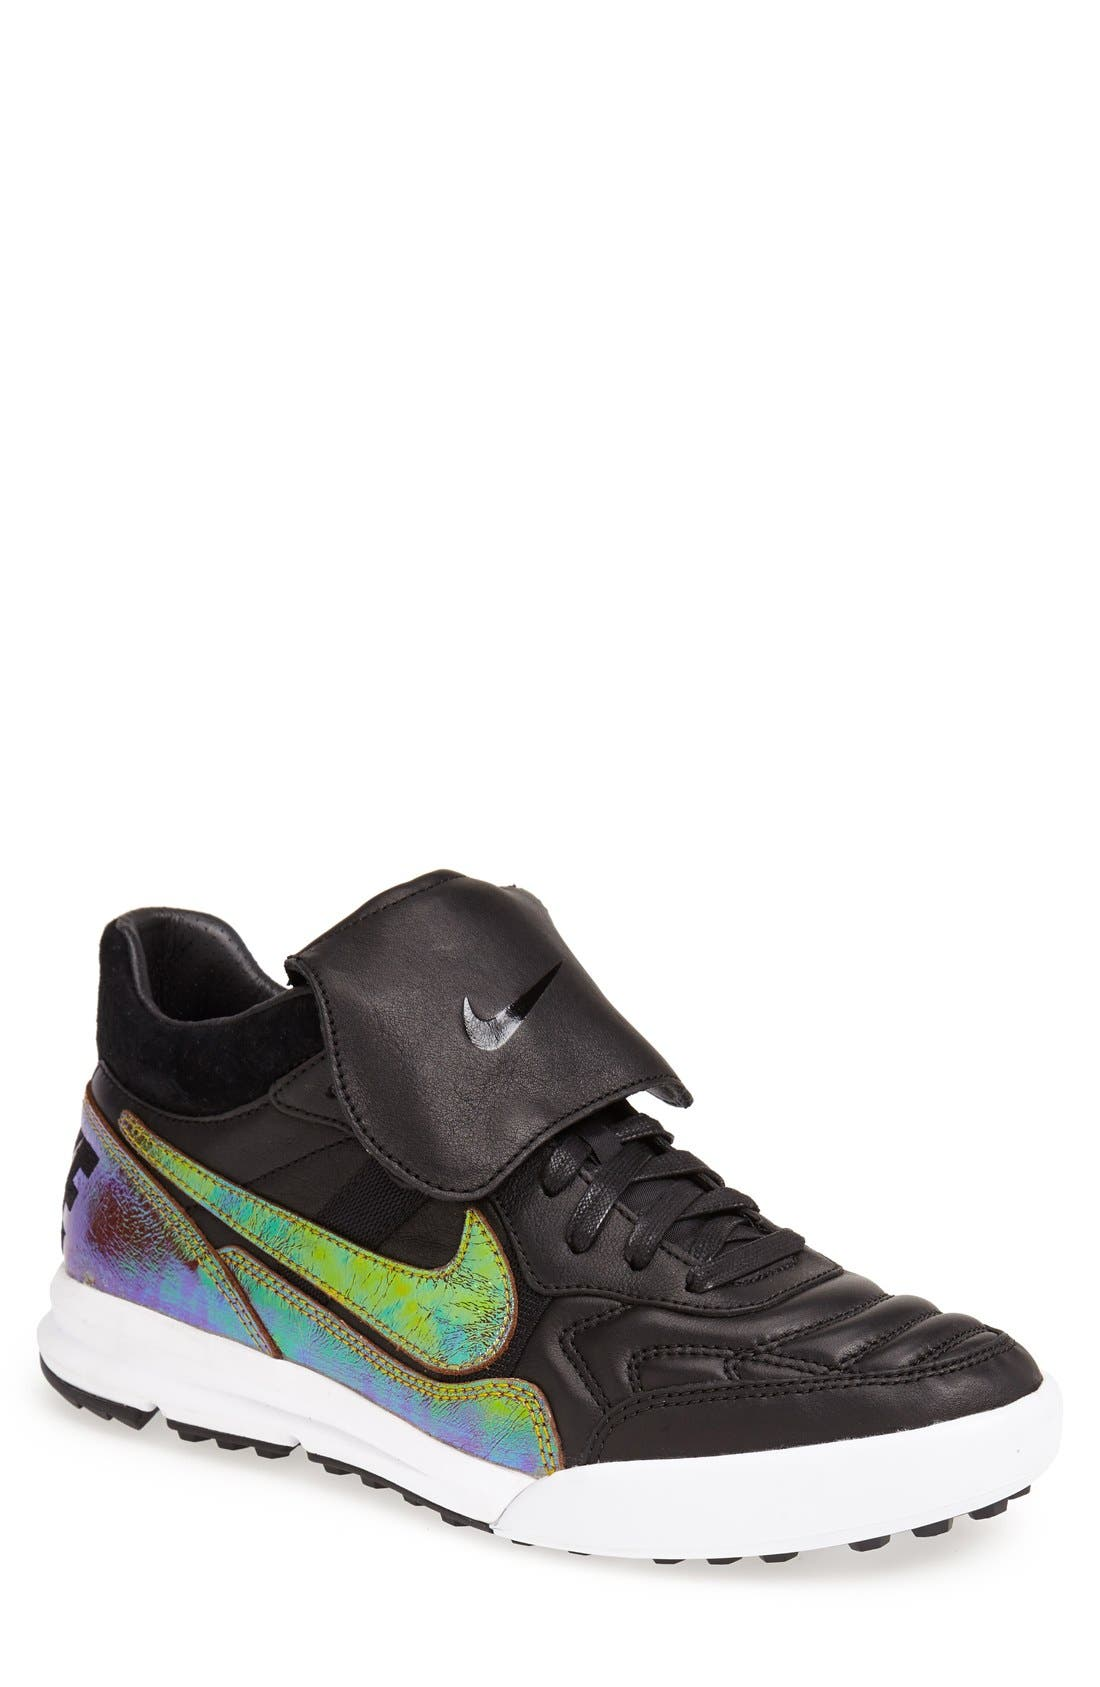 Tp Indoor Qs 'tiempo men Shoe Nike Mid Soccer 94 Pack' Trophy xqRC1H7w